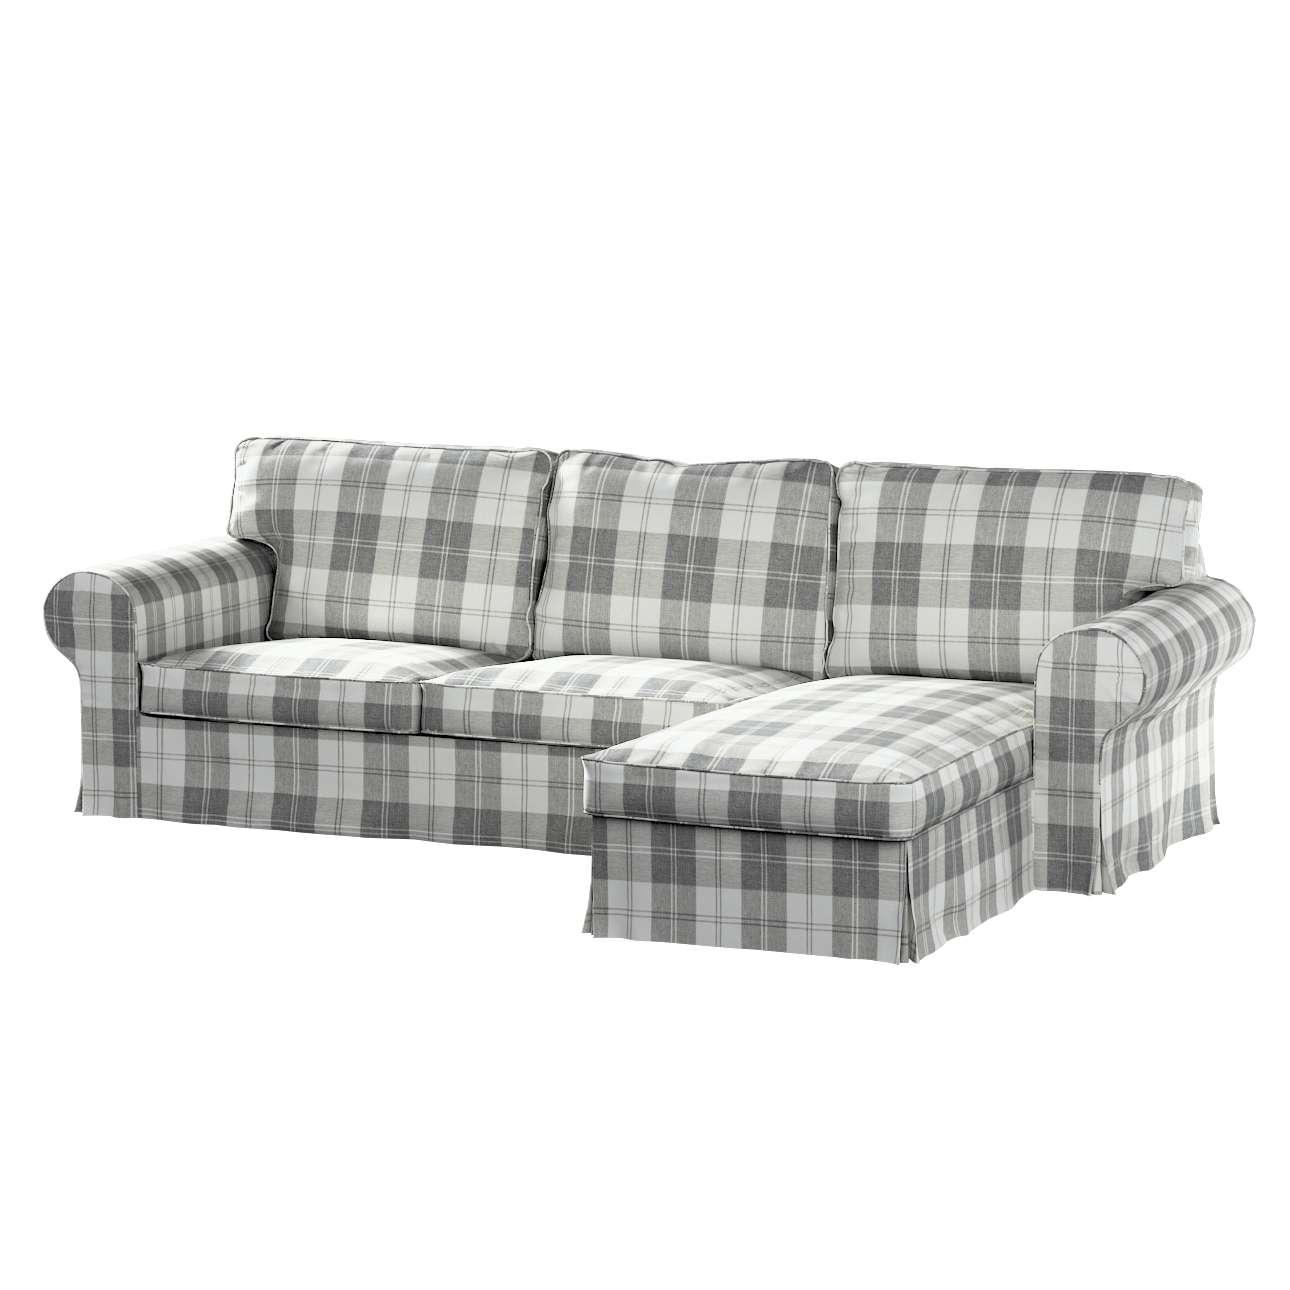 Ektorp 2-Sitzer Sofabezug mit Recamiere Ektorp 2-Sitzer Sofabezug mit Recamiere von der Kollektion Edinburgh , Stoff: 115-79